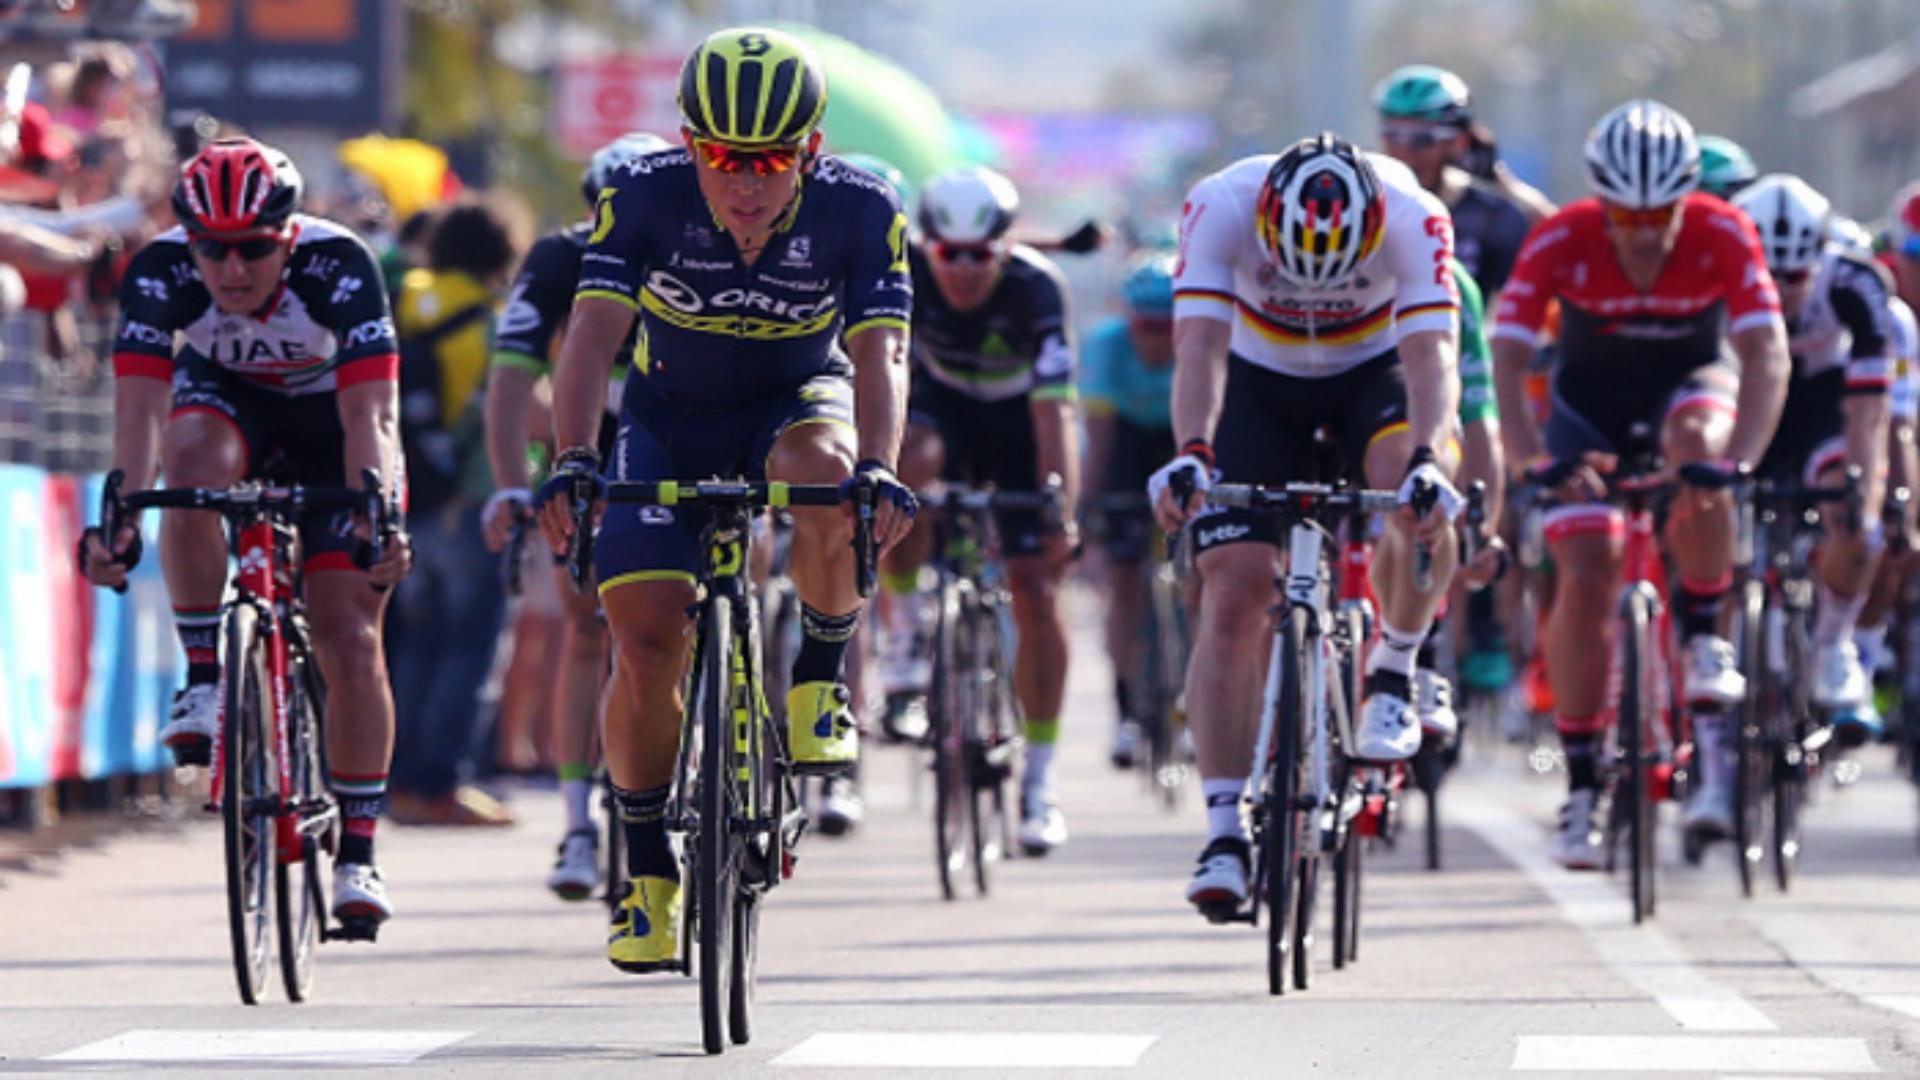 Giro d italia stage 3 betting in cash